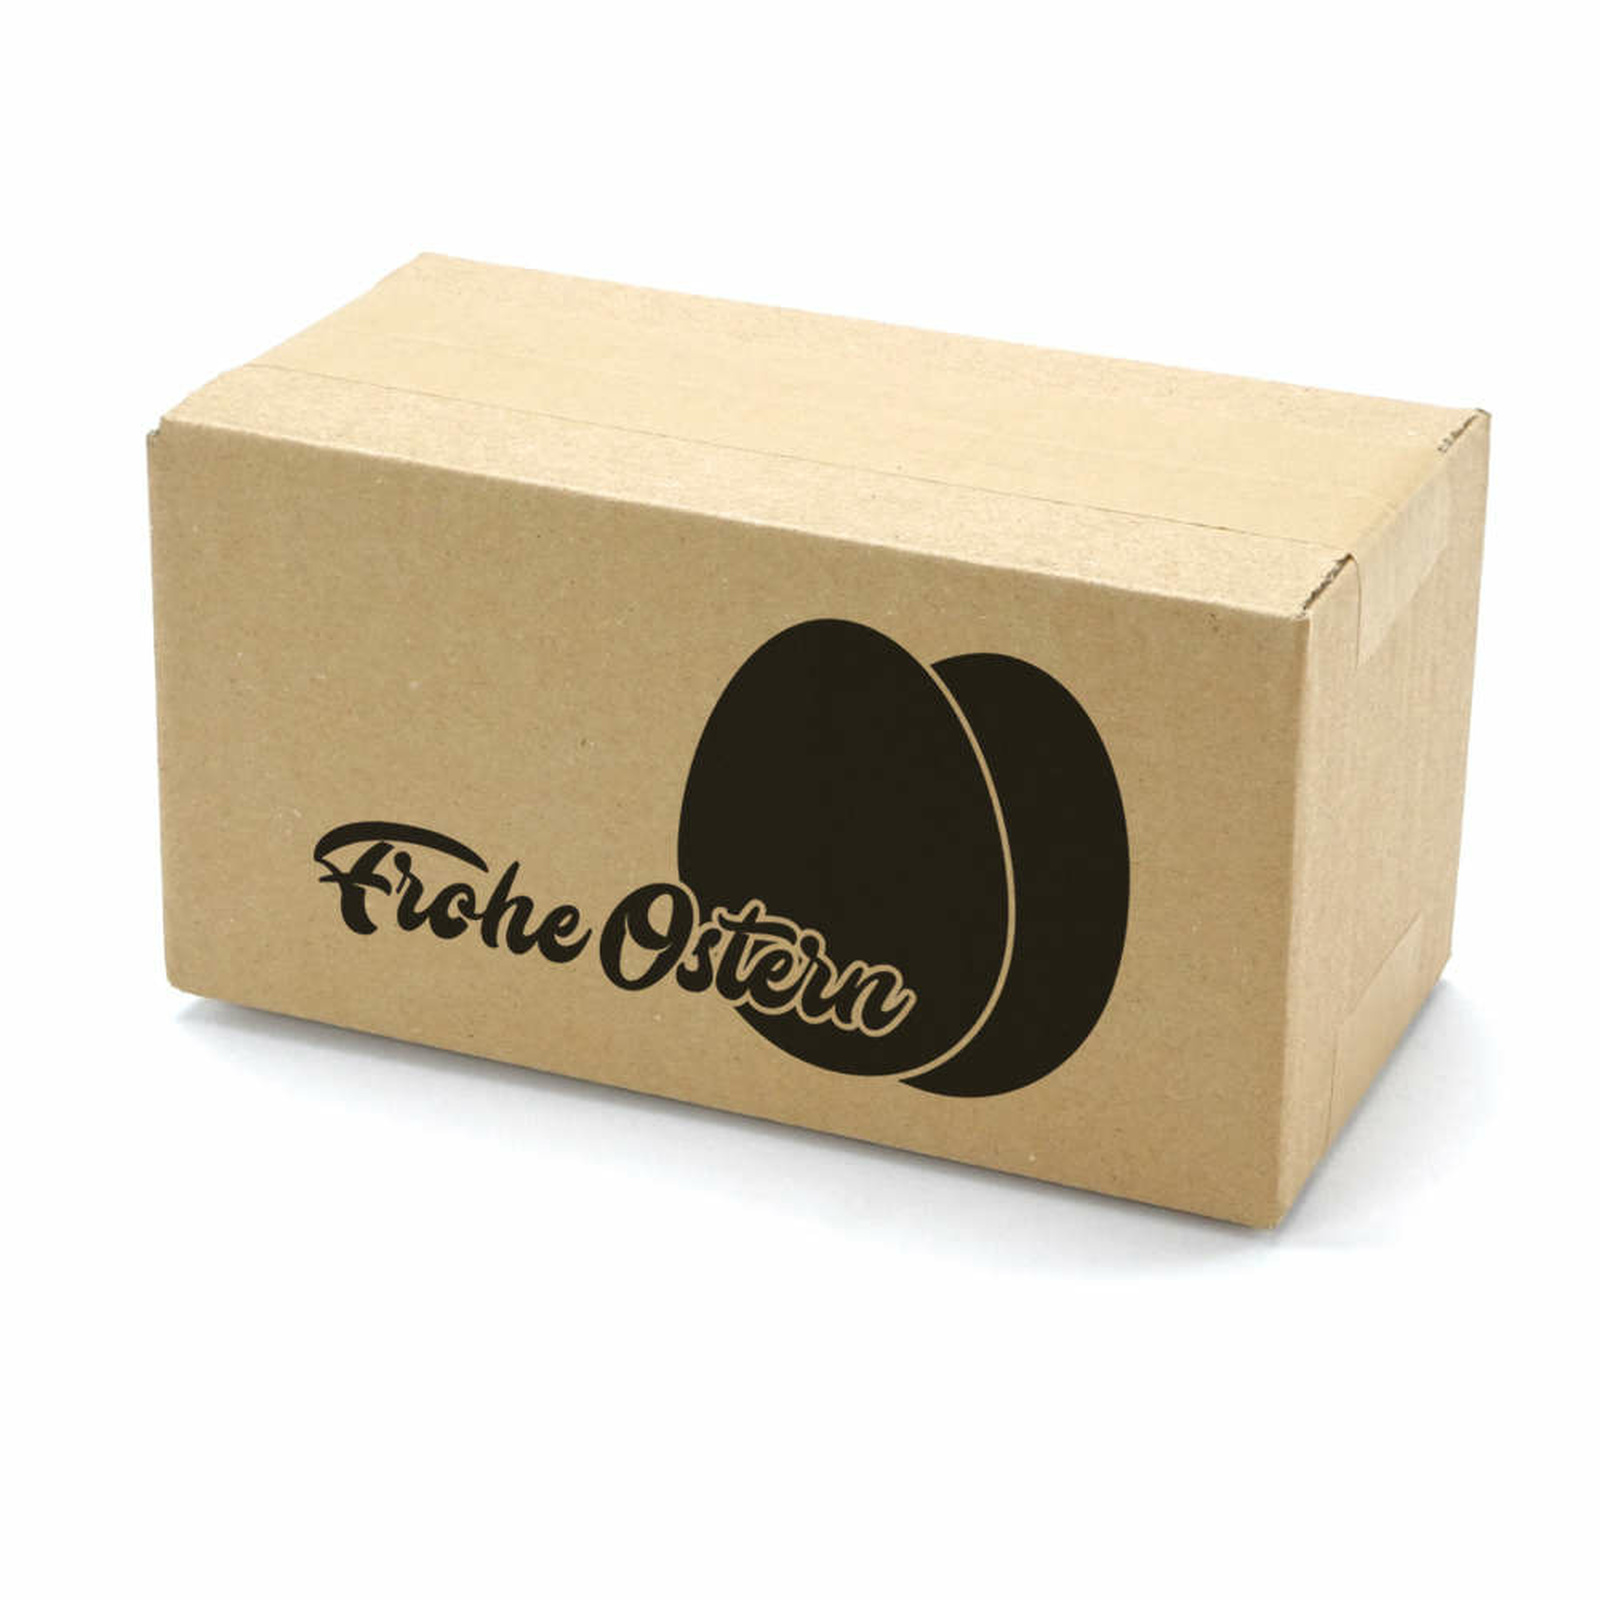 einwellige kartons 200x100x100 mm mit ostermotiv g nstig. Black Bedroom Furniture Sets. Home Design Ideas